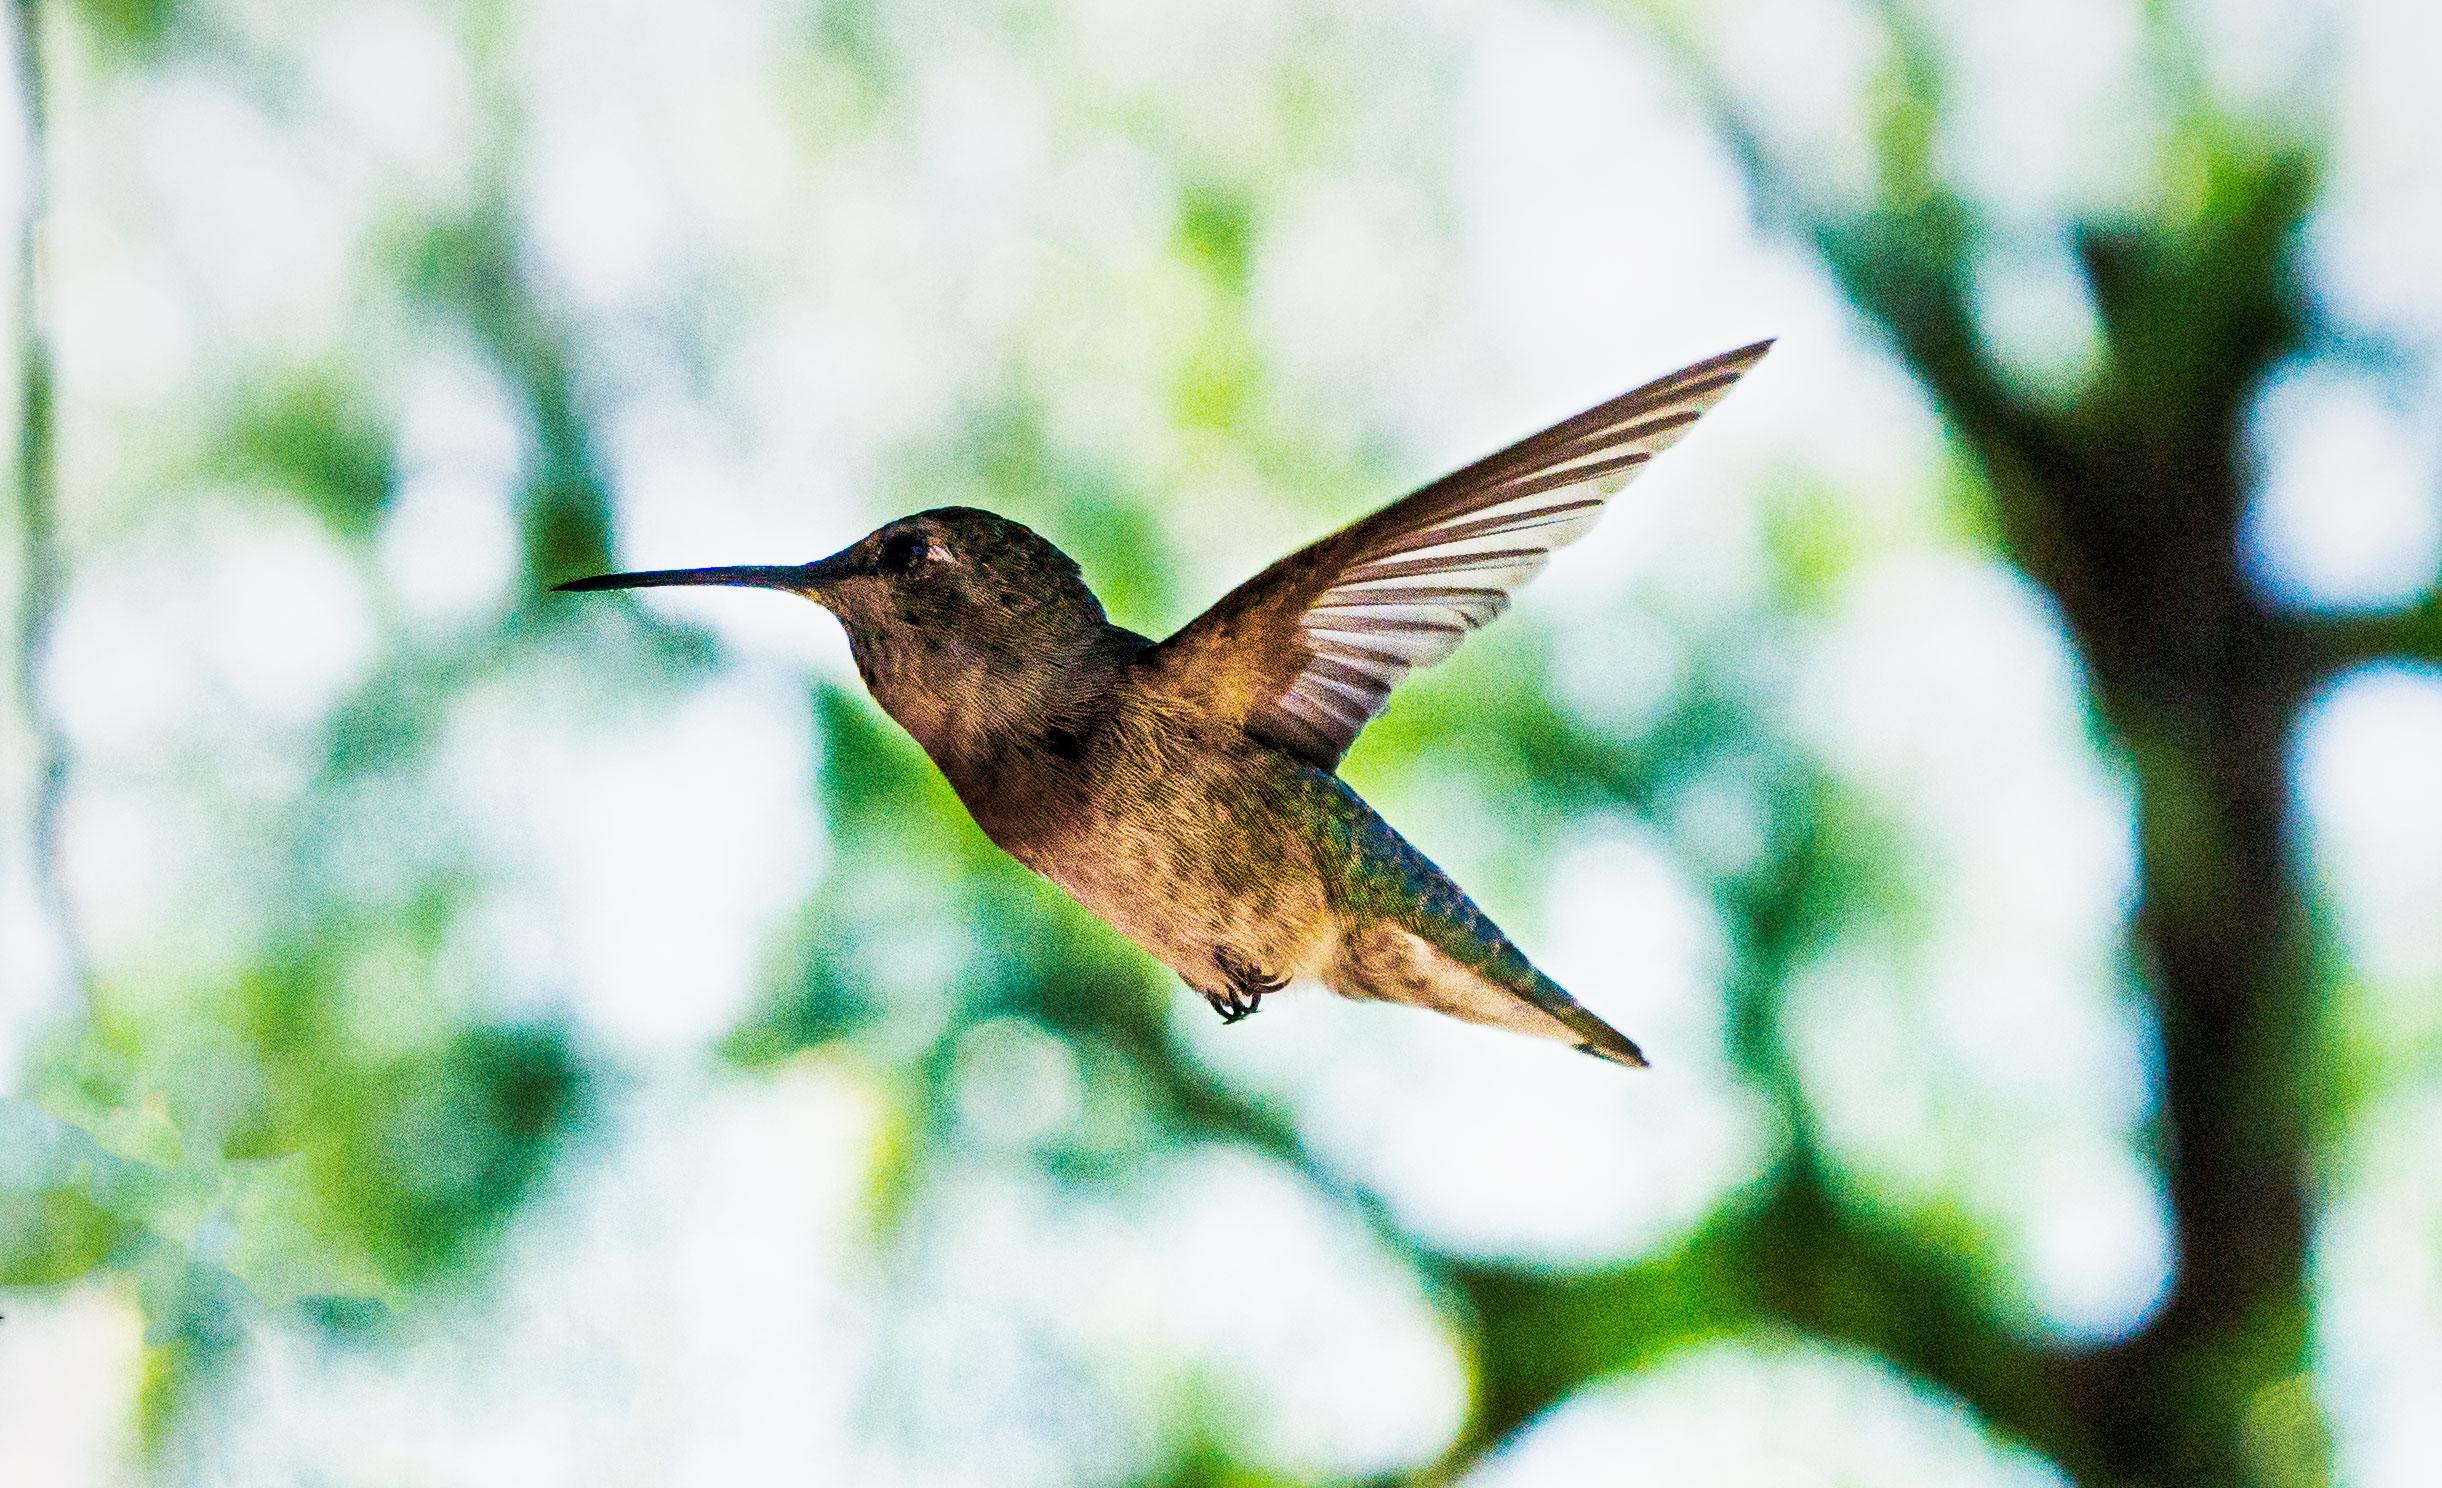 vickygood_photography_nature_hummingbird.jpg